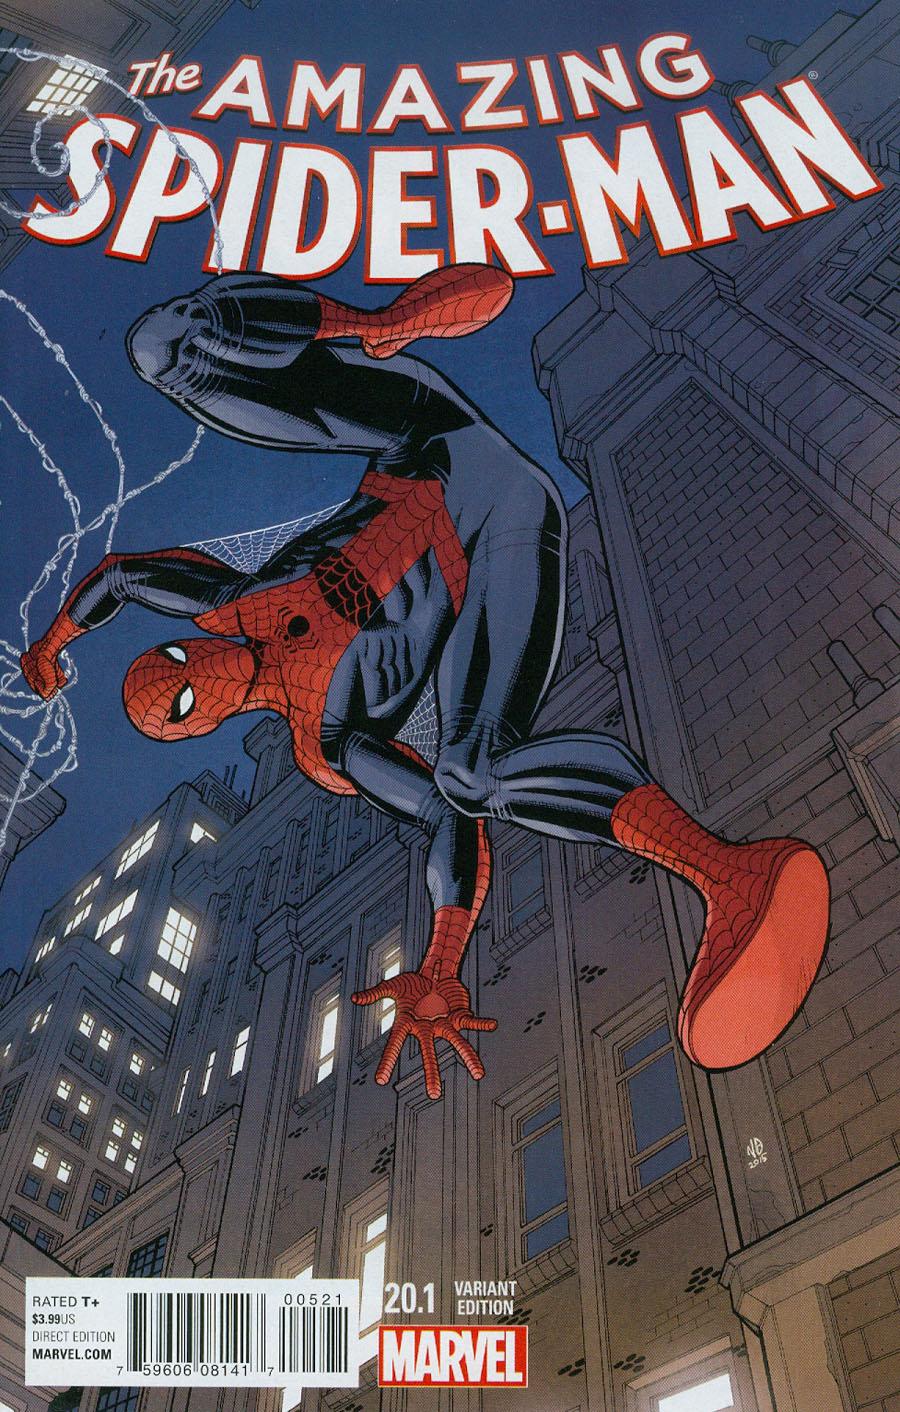 Amazing Spider-Man Vol 3 #20.1 Cover B Variant Nick Bradshaw Cover